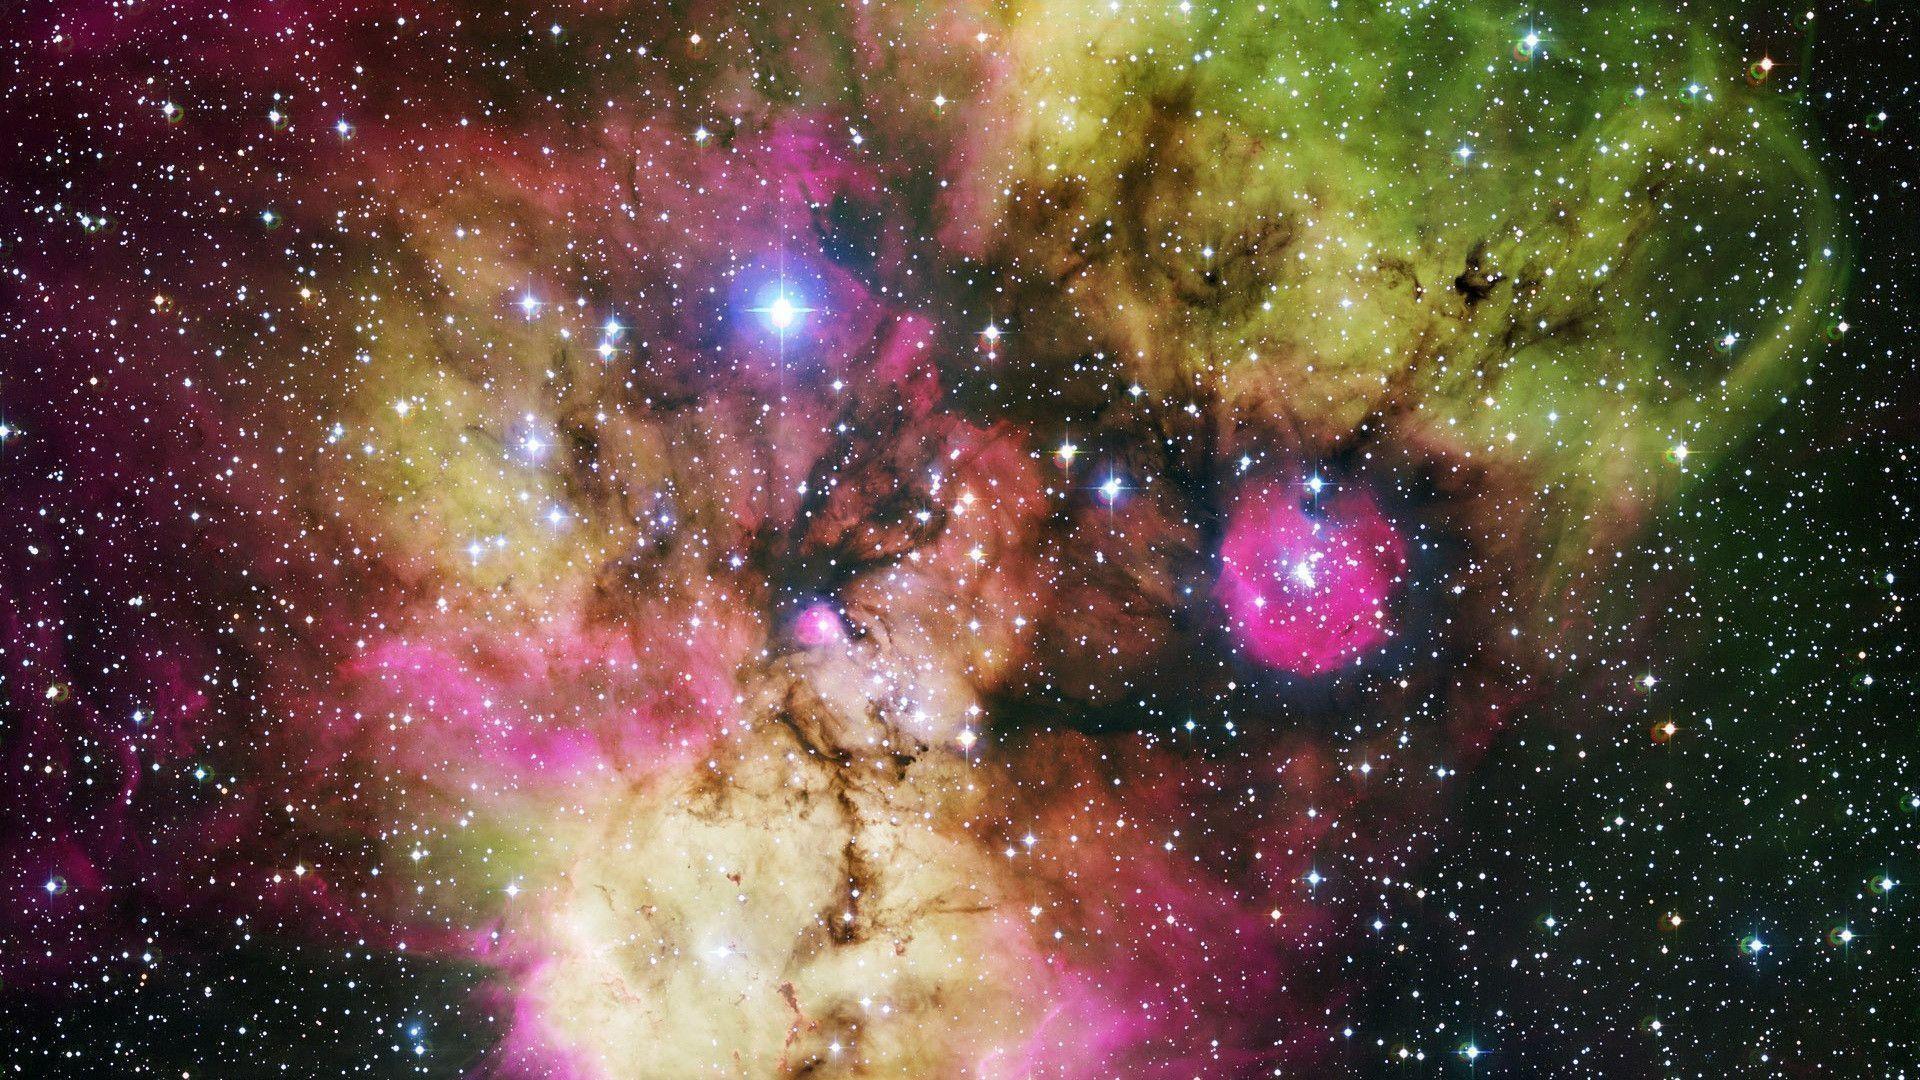 Colorful Galaxy Hubble Wallpaper | resolution wallpaper .